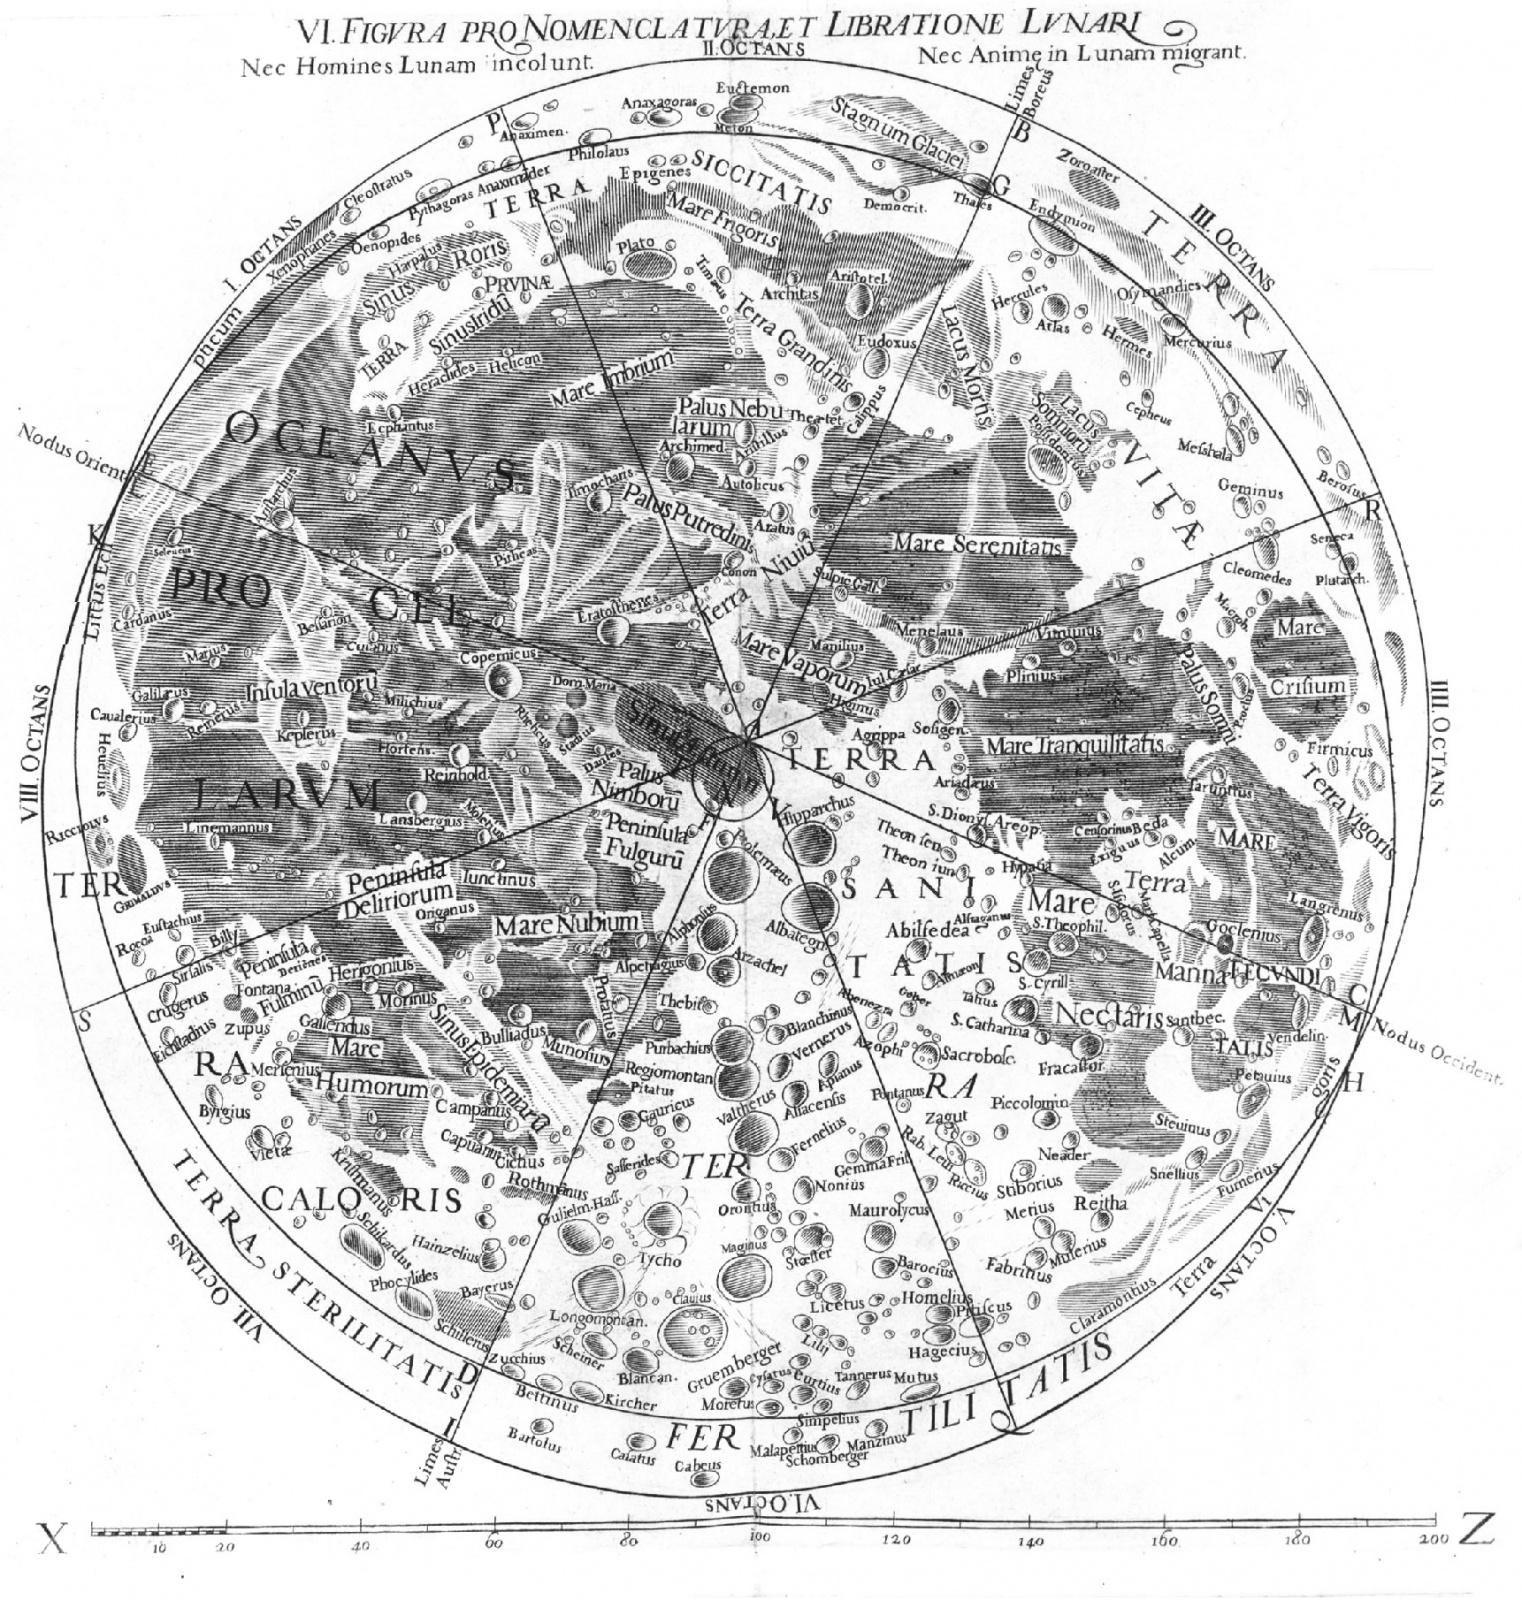 Moon_map_Almagestum_novum.thumb.jpg.d8bd2629c85fcfa3db34afcd1f9be2ca.jpg